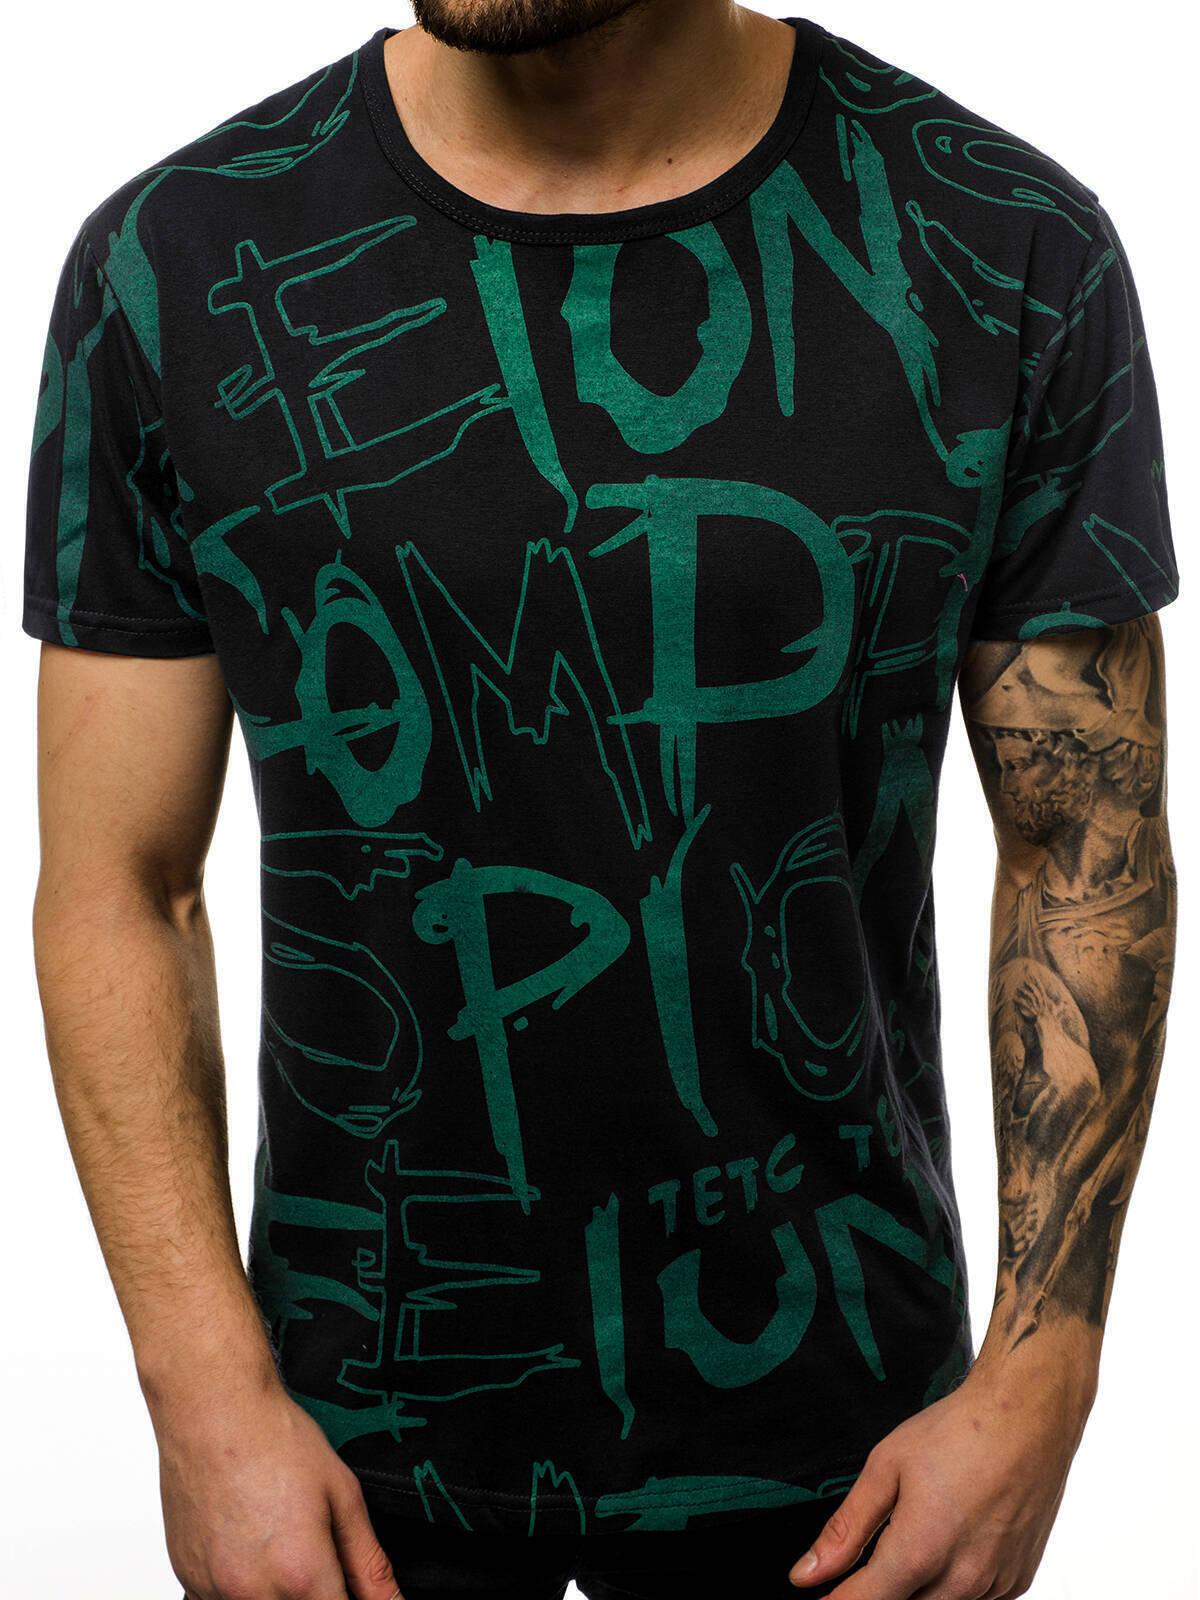 Indexbild 10 - T-Shirt Kurzarm Print Aufdruck Fitness Jogging Sport Shirt Herren OZONEE 12511